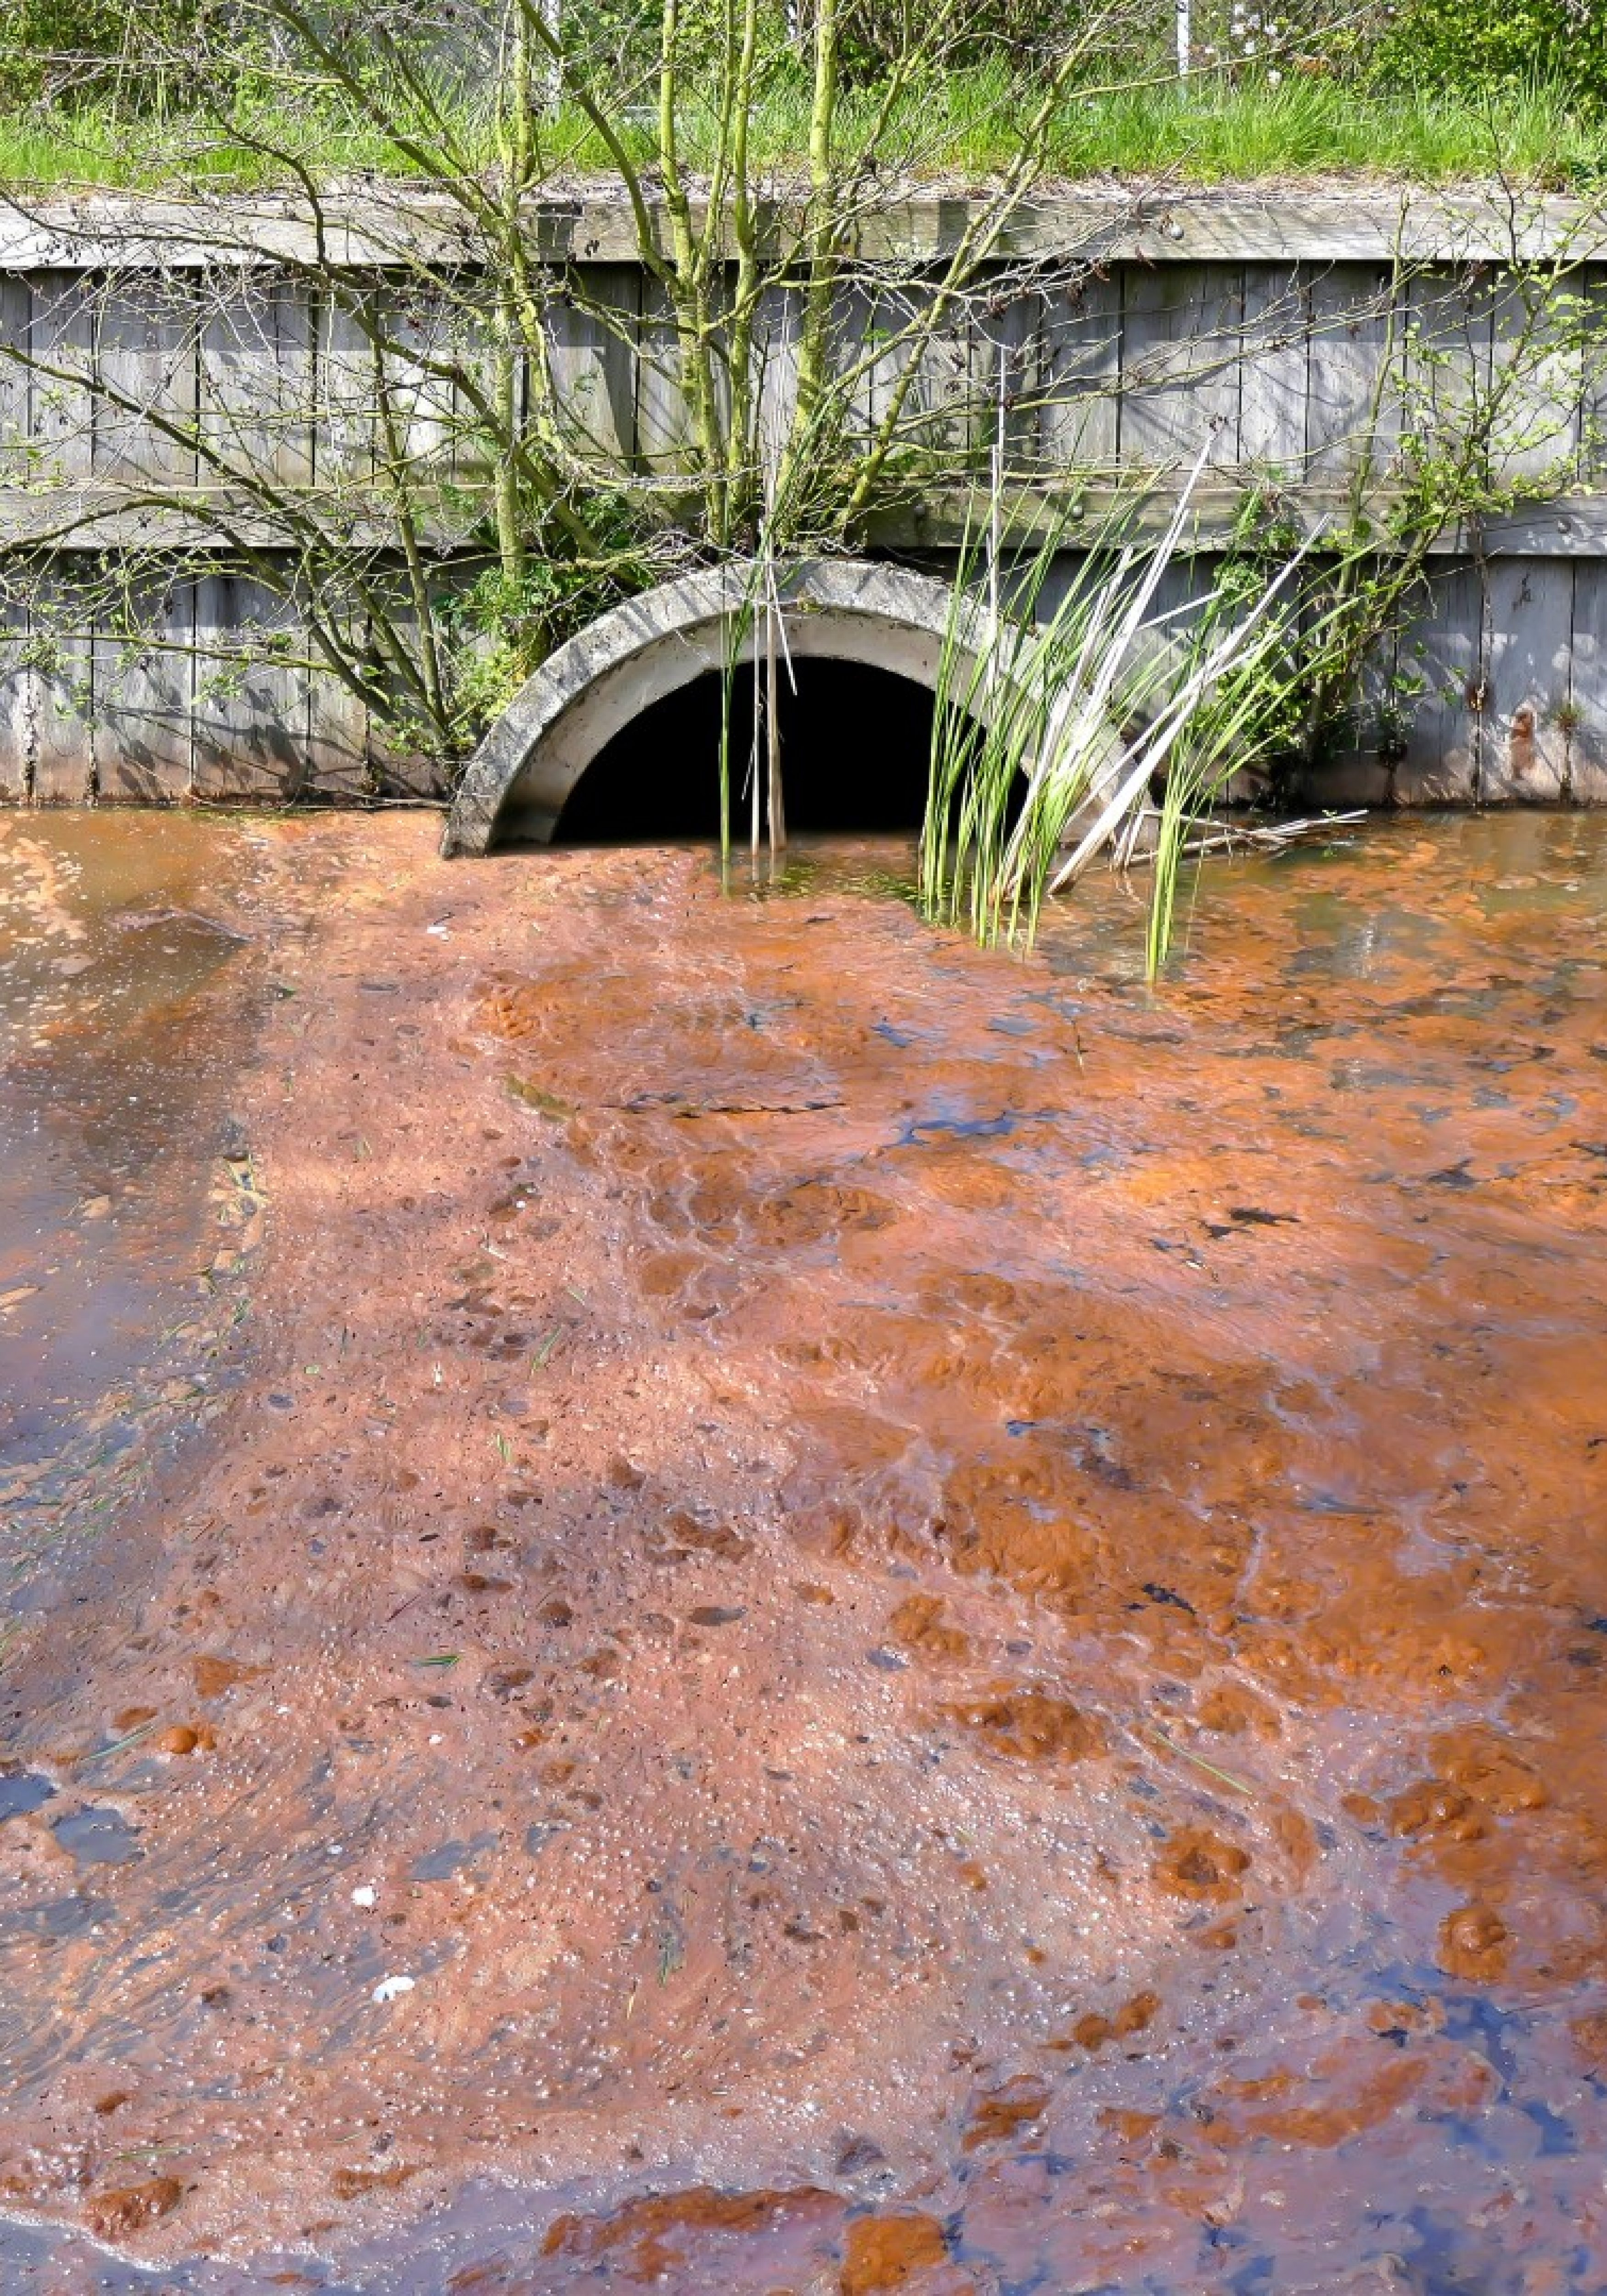 sewage-spill-Large-3500x5000.jpg